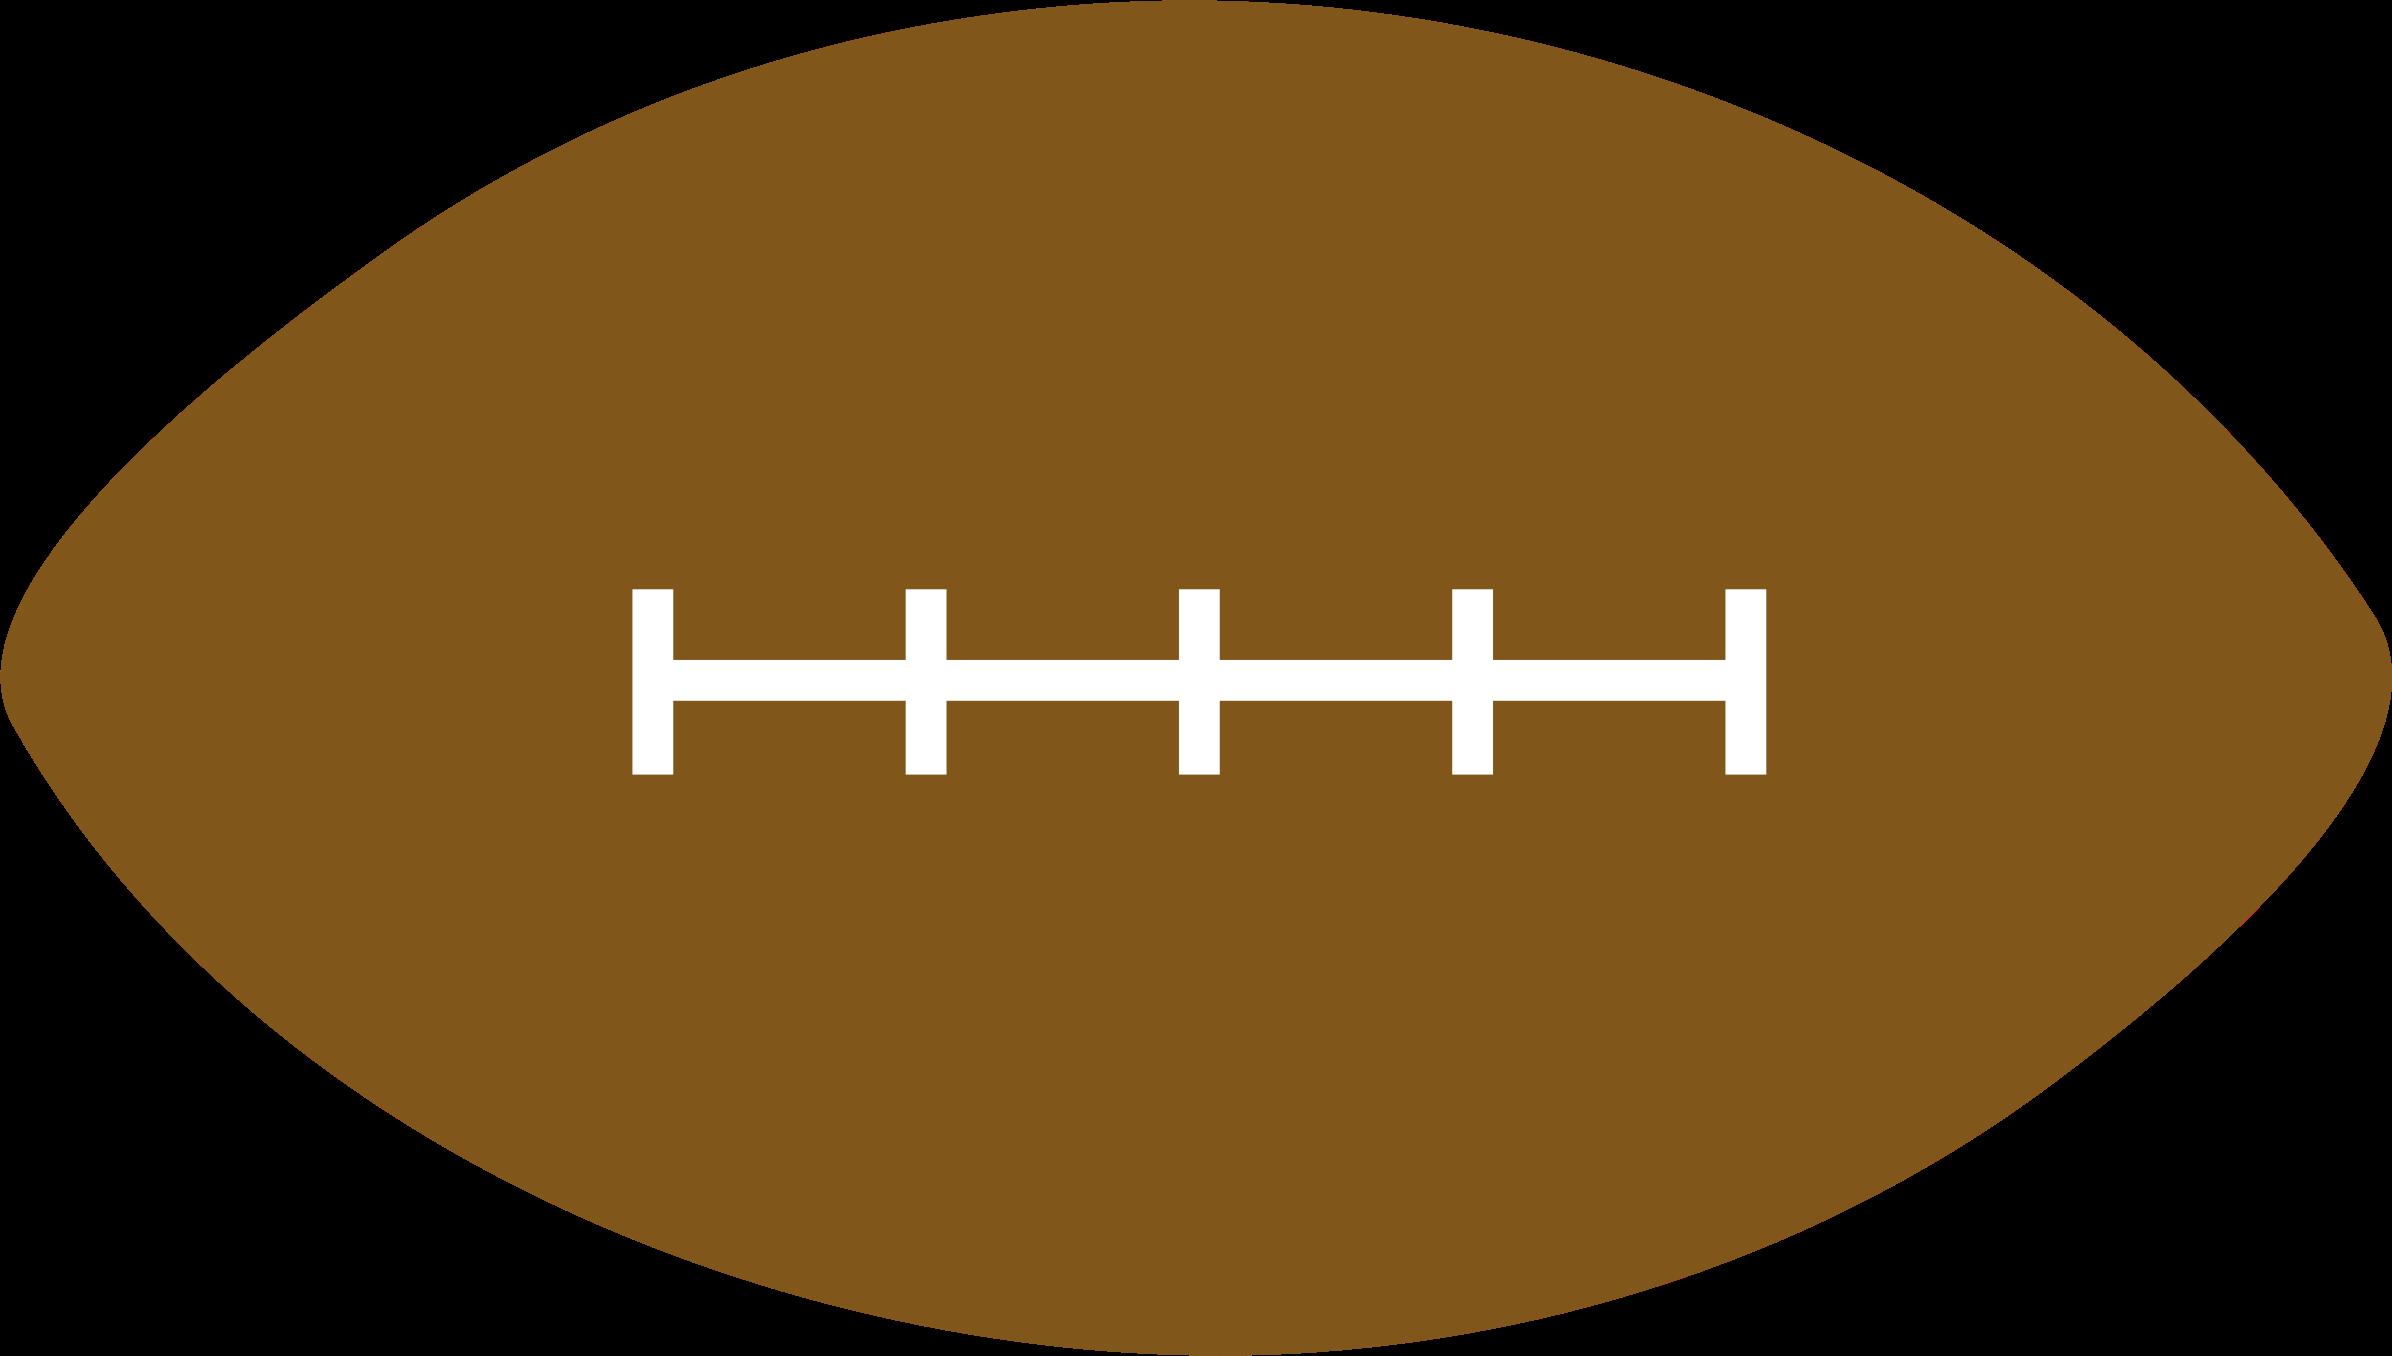 Football shape clipart banner freeuse stock Clipart - American Football banner freeuse stock